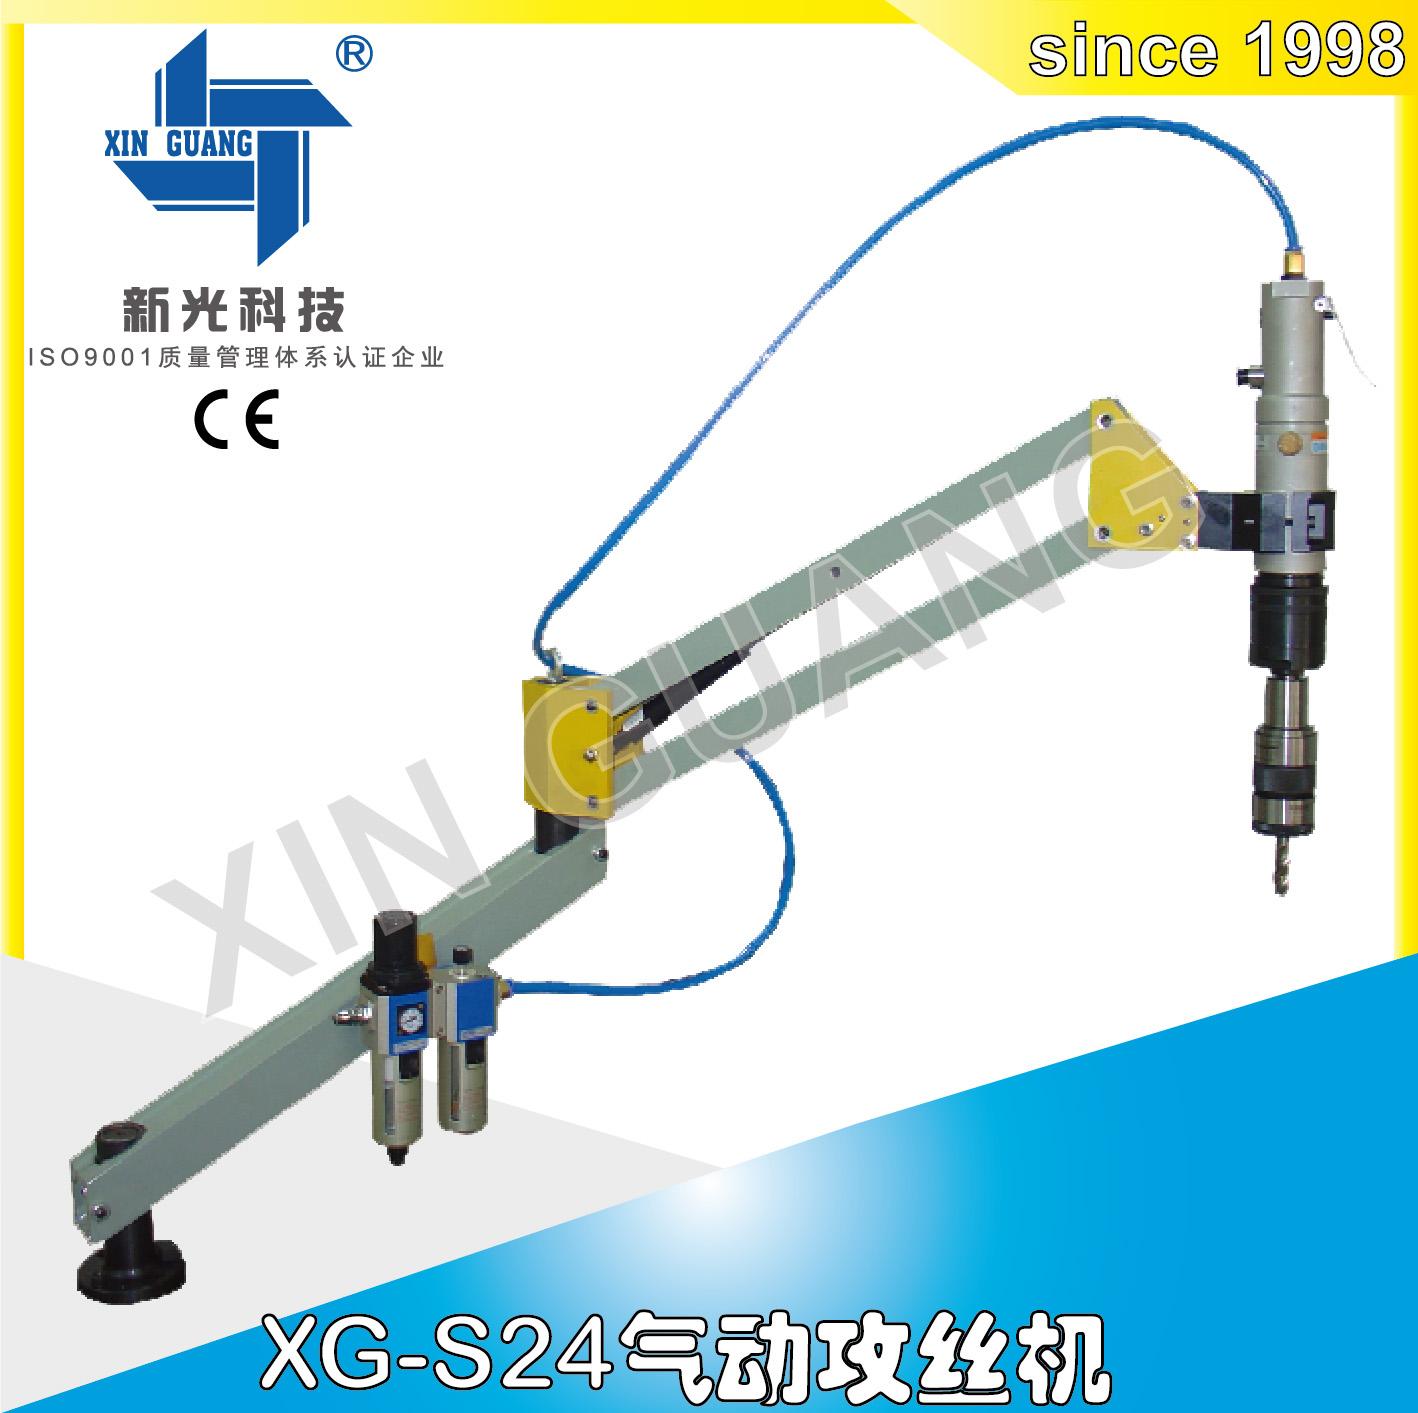 XG-S24型(M3-M24)气动攻丝机 轻松攻螺纹